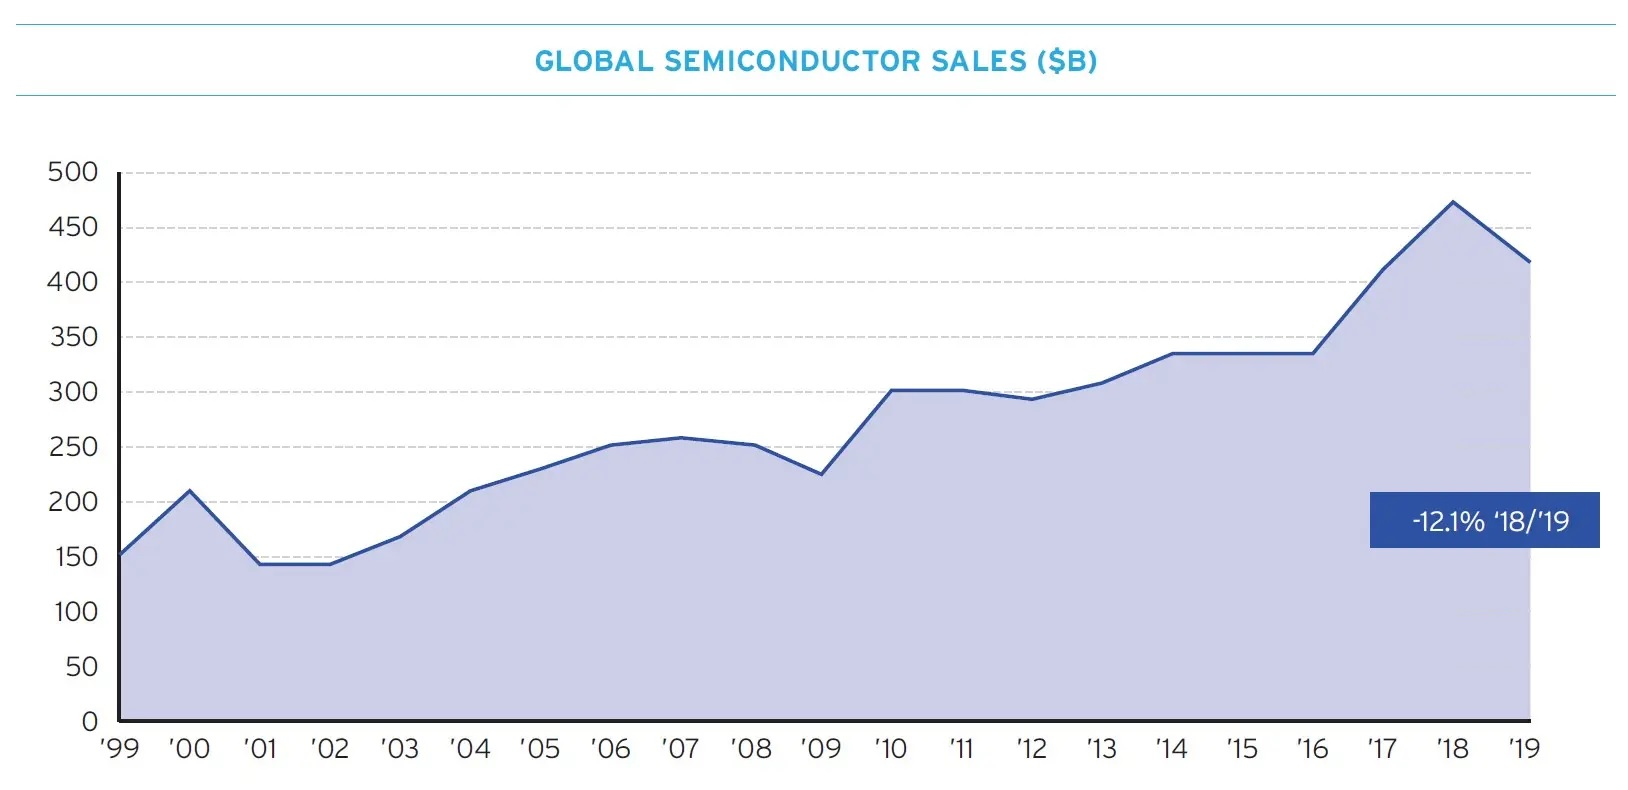 Global Semiconductor Sales 2020